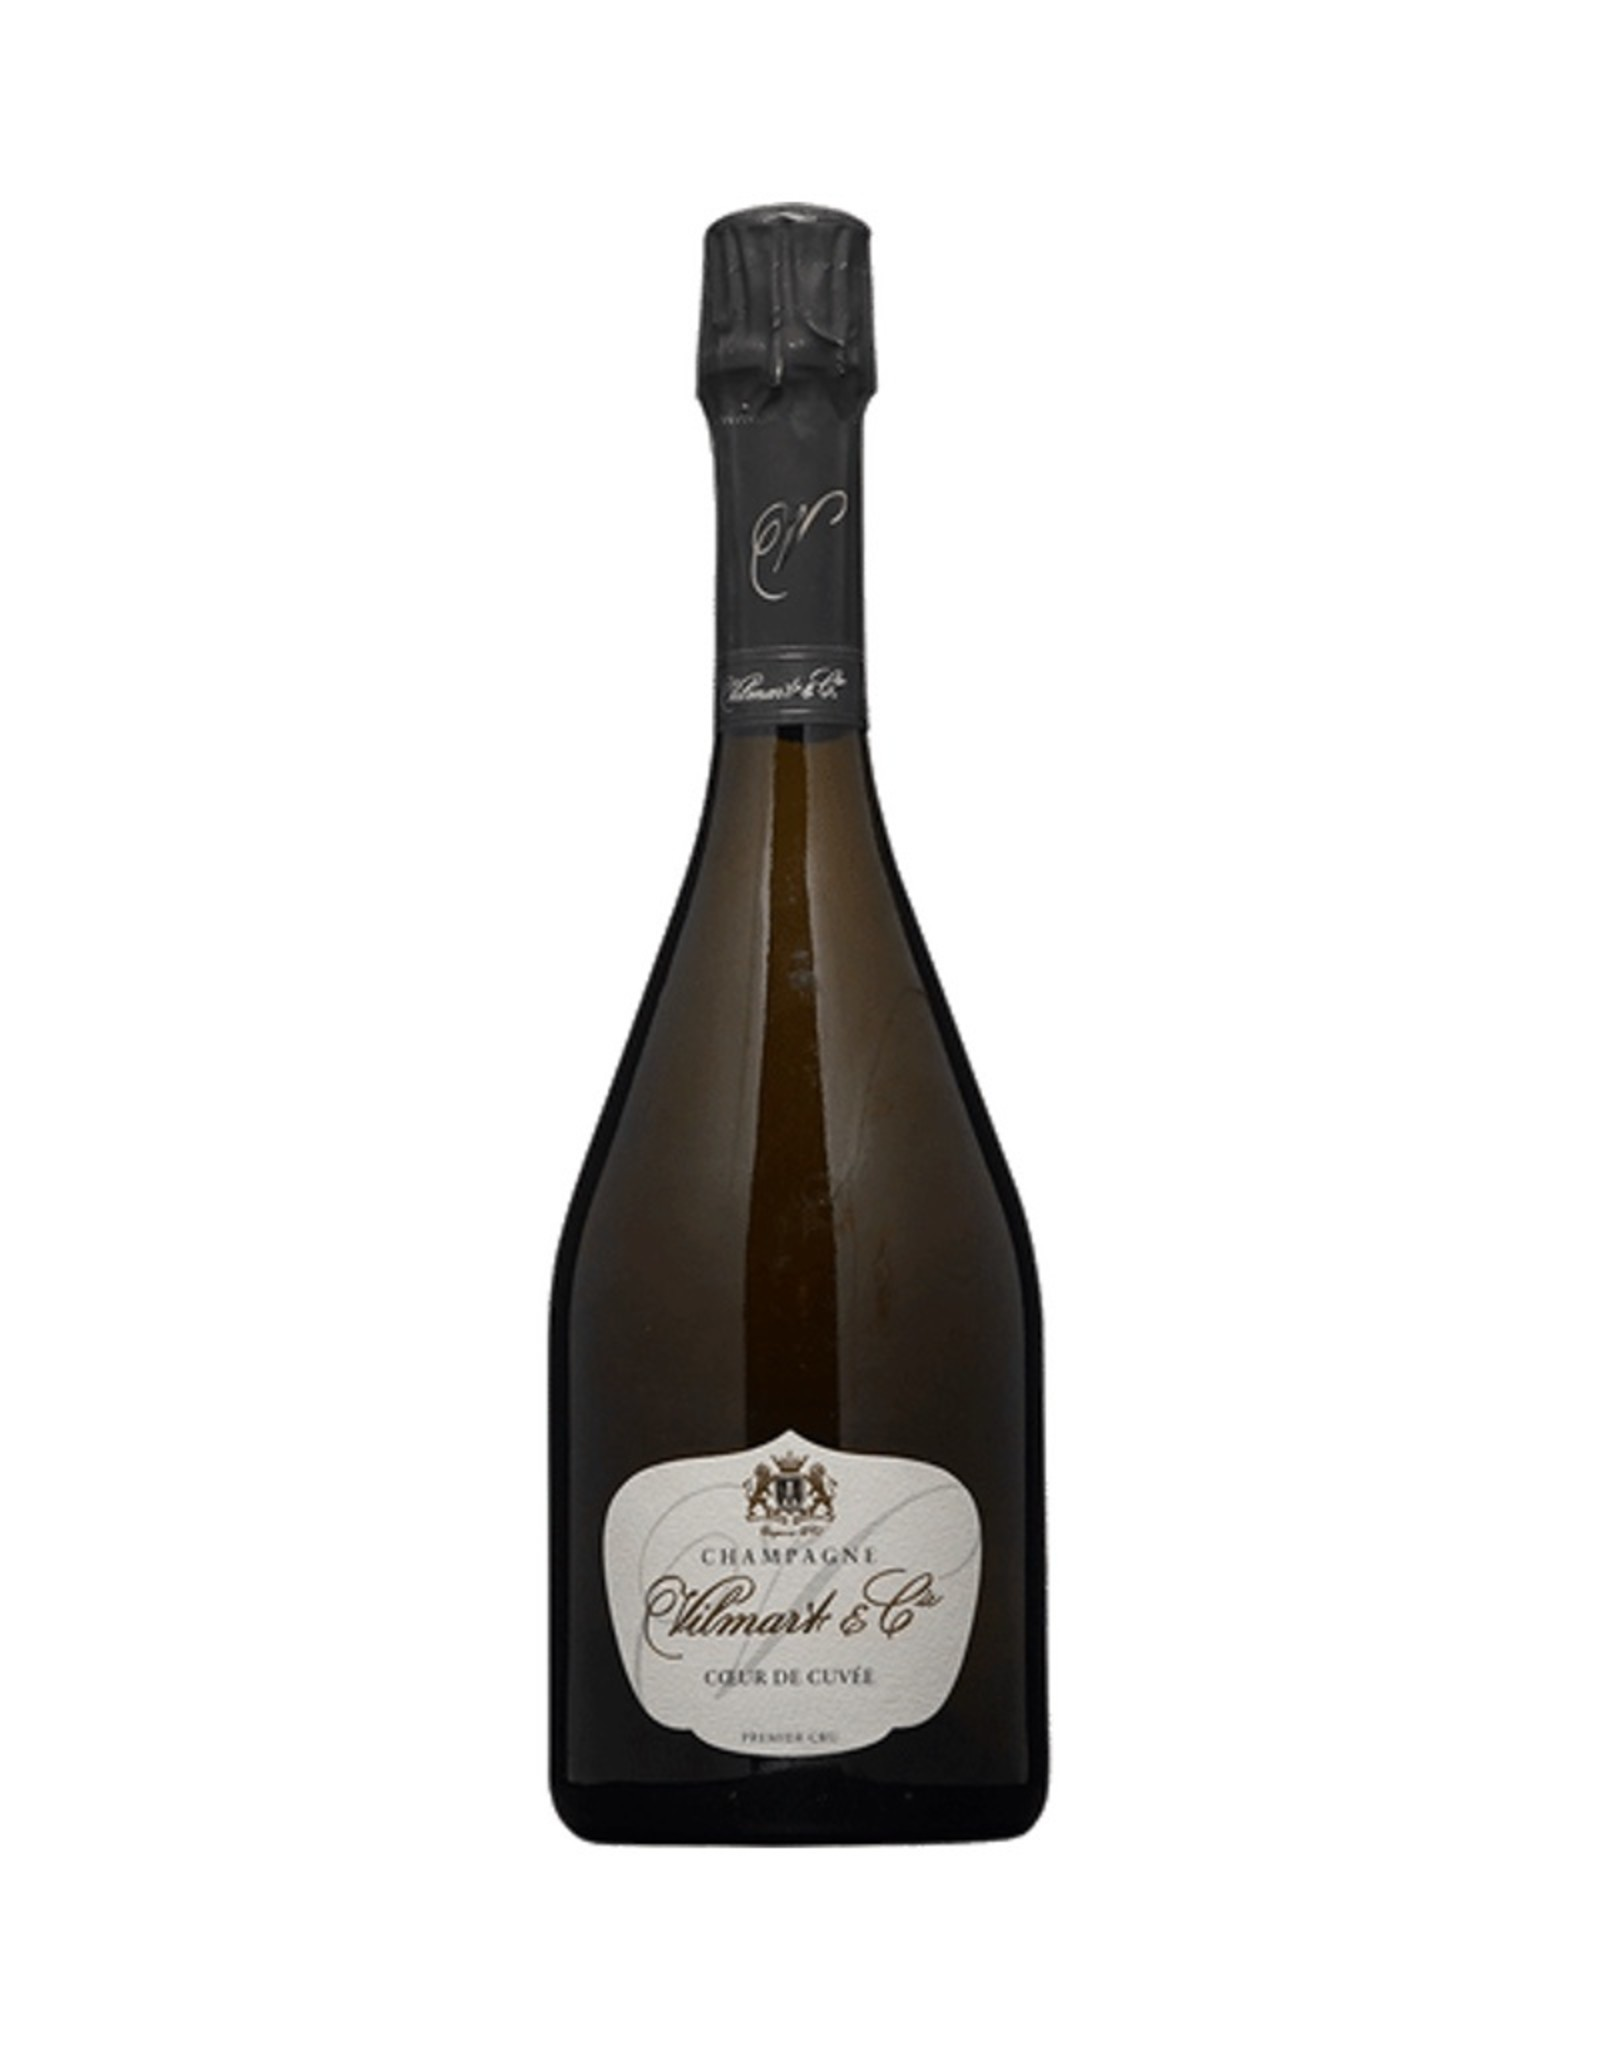 Vilmart & Co Grande Reserve Premier Cru Champagne